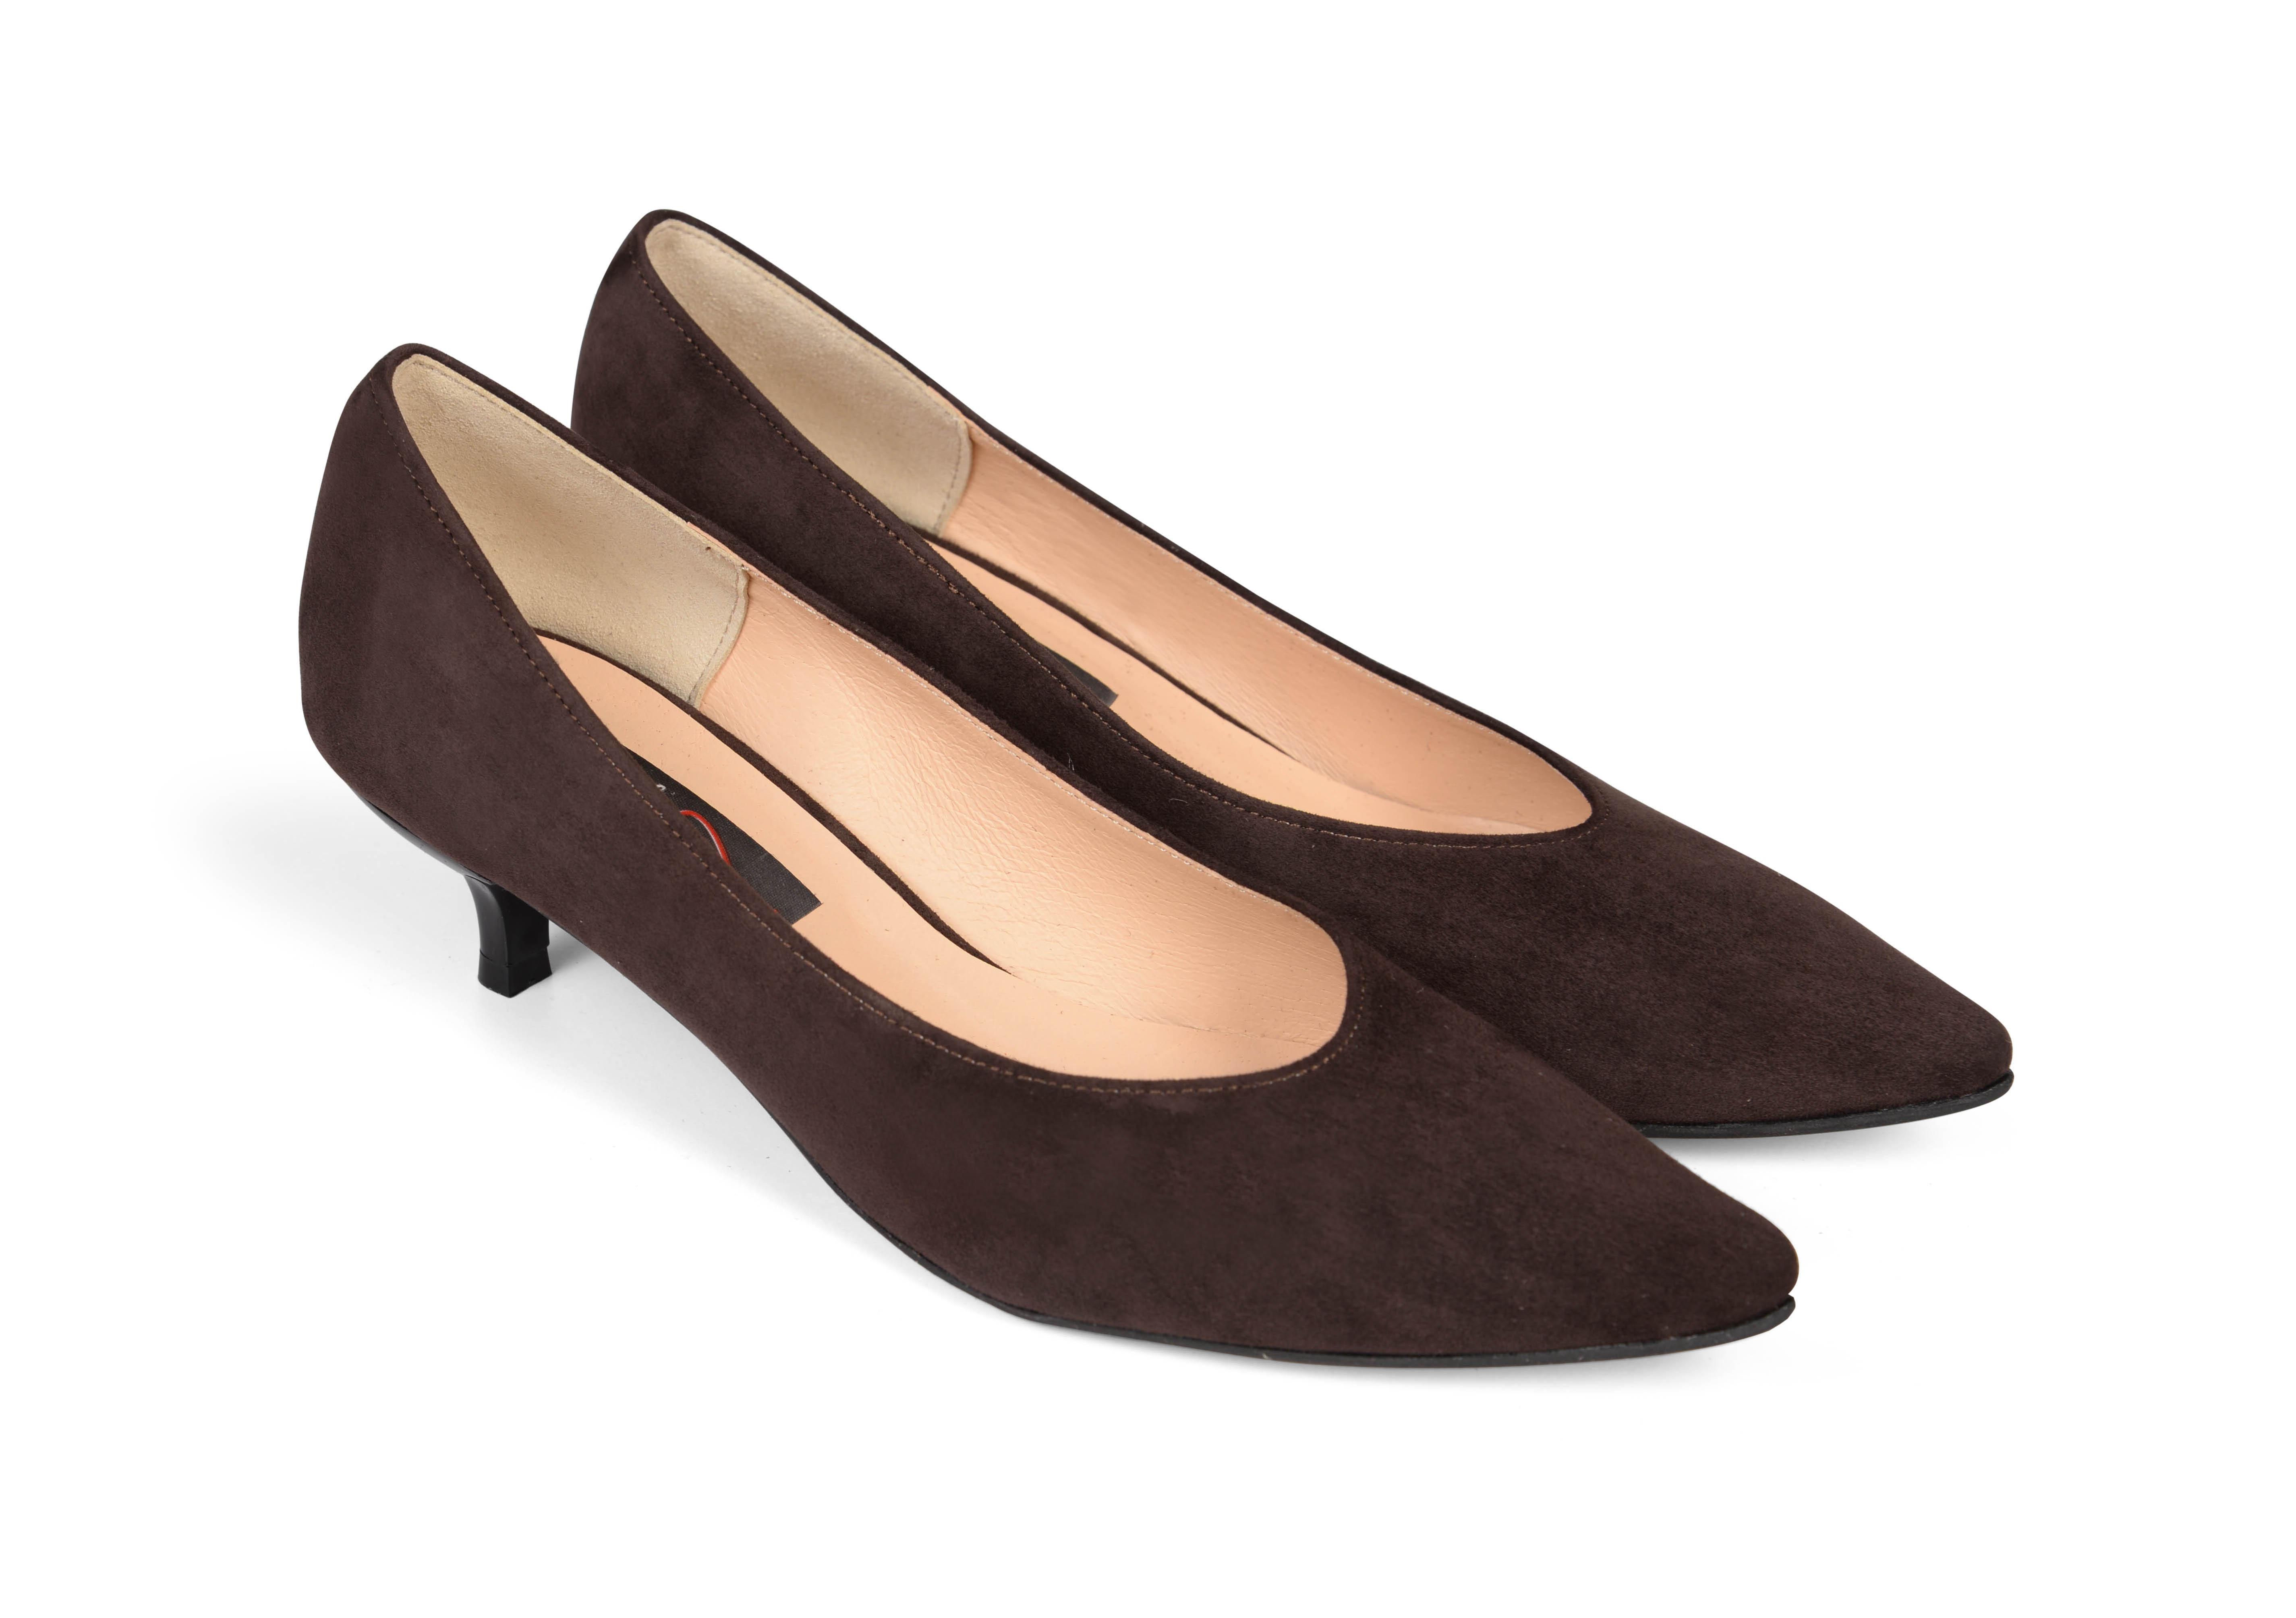 kiki S pointed toe kitten heels - dark brown